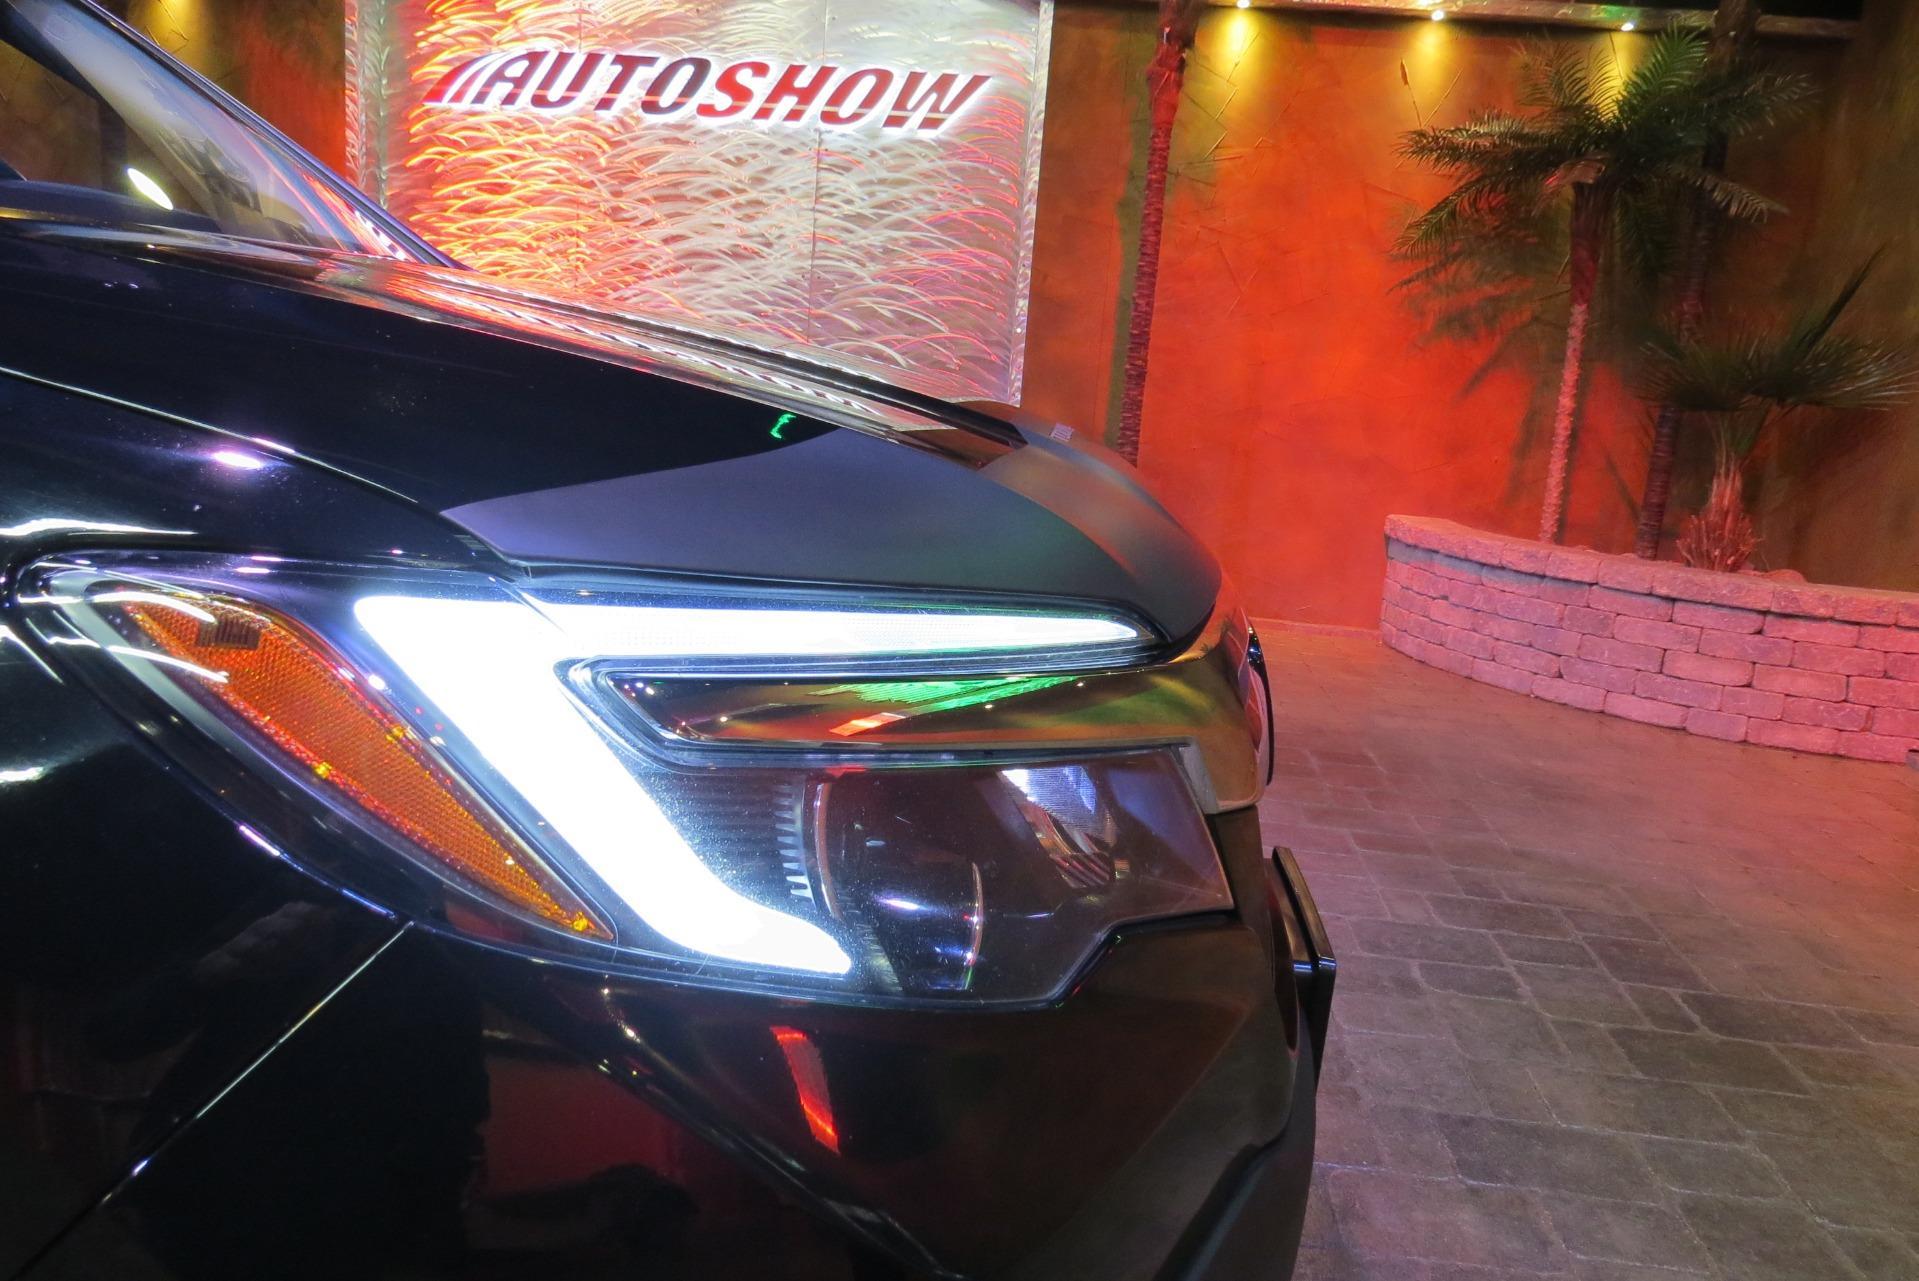 used 2017 Honda Ridgeline car, priced at $32,600